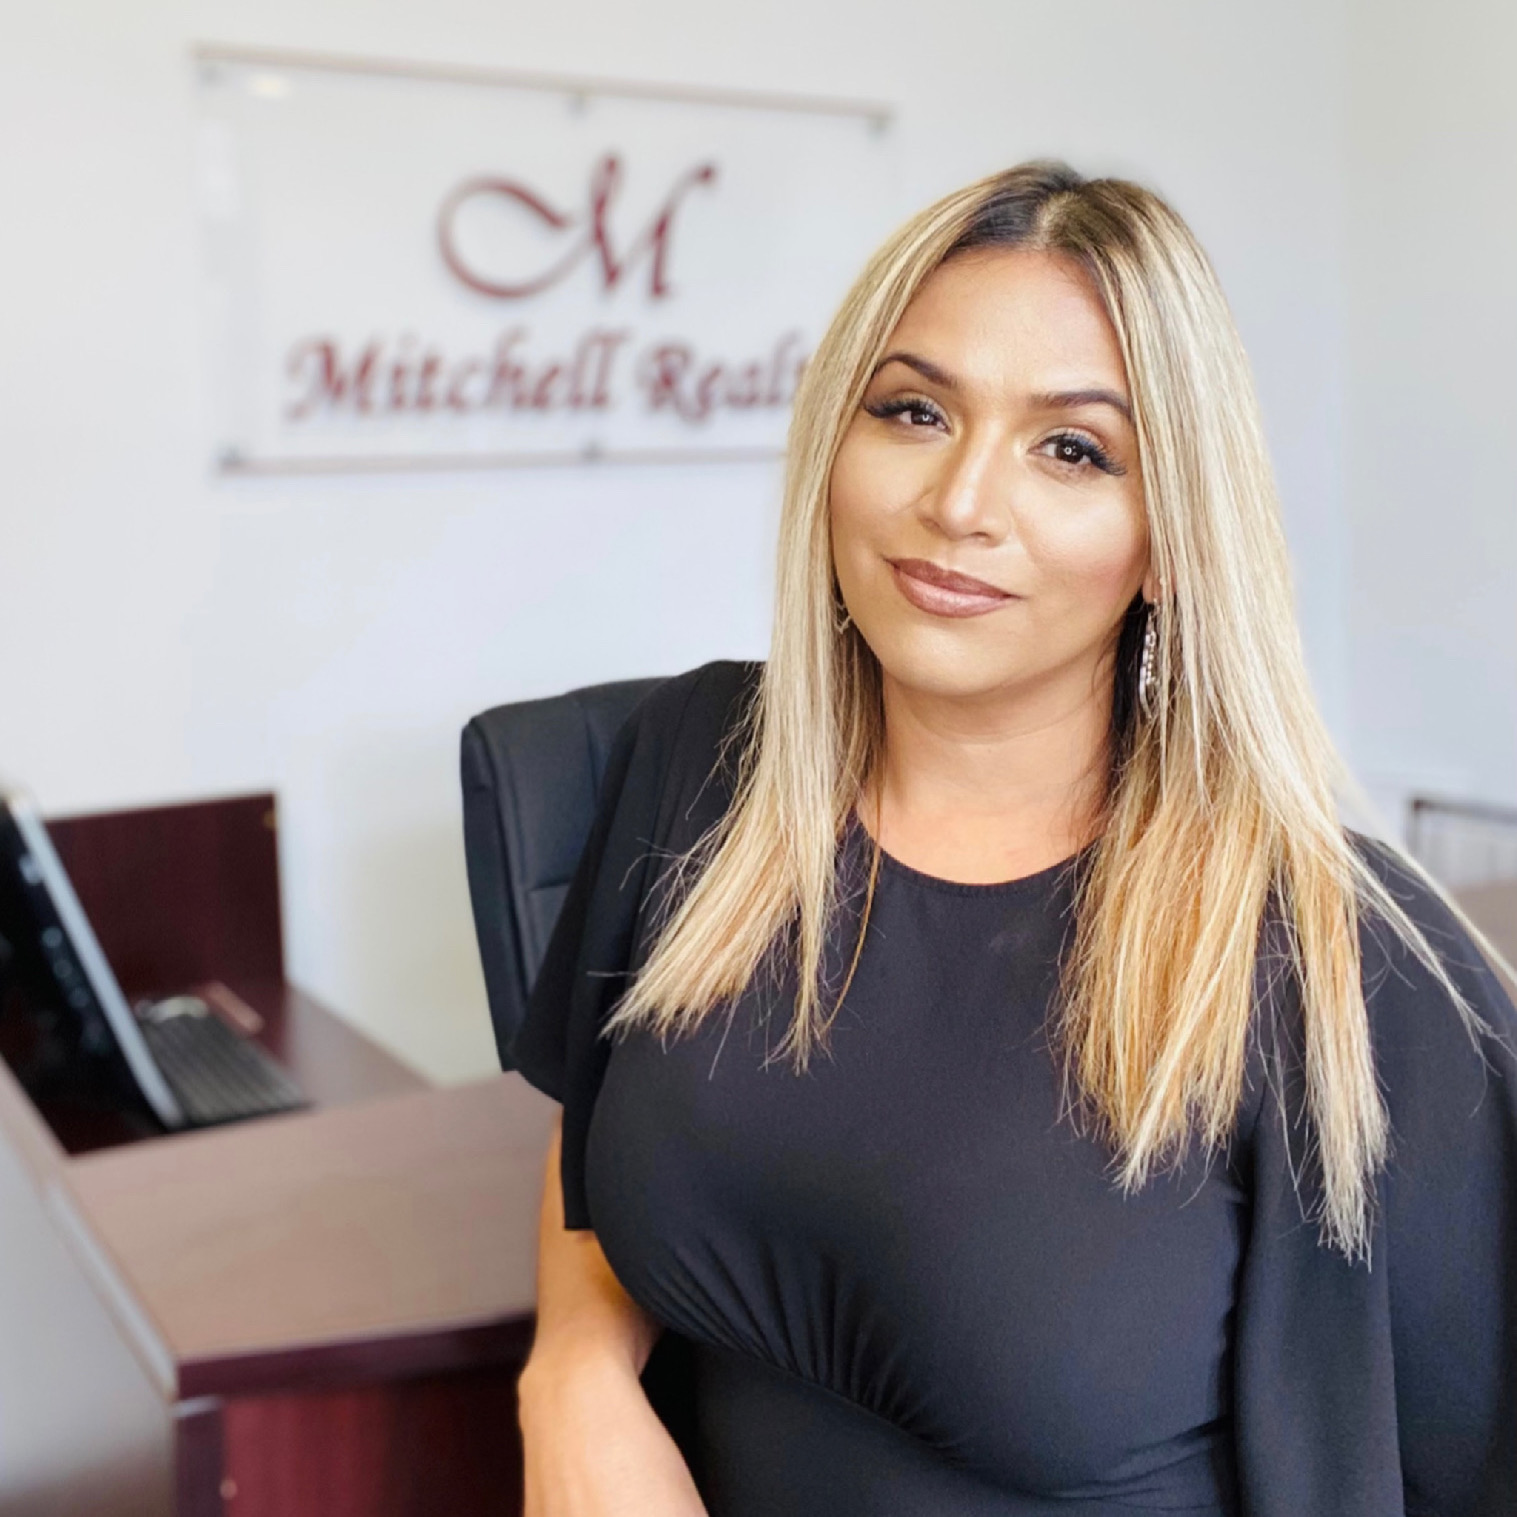 Mari Mitchell Broker/Owner